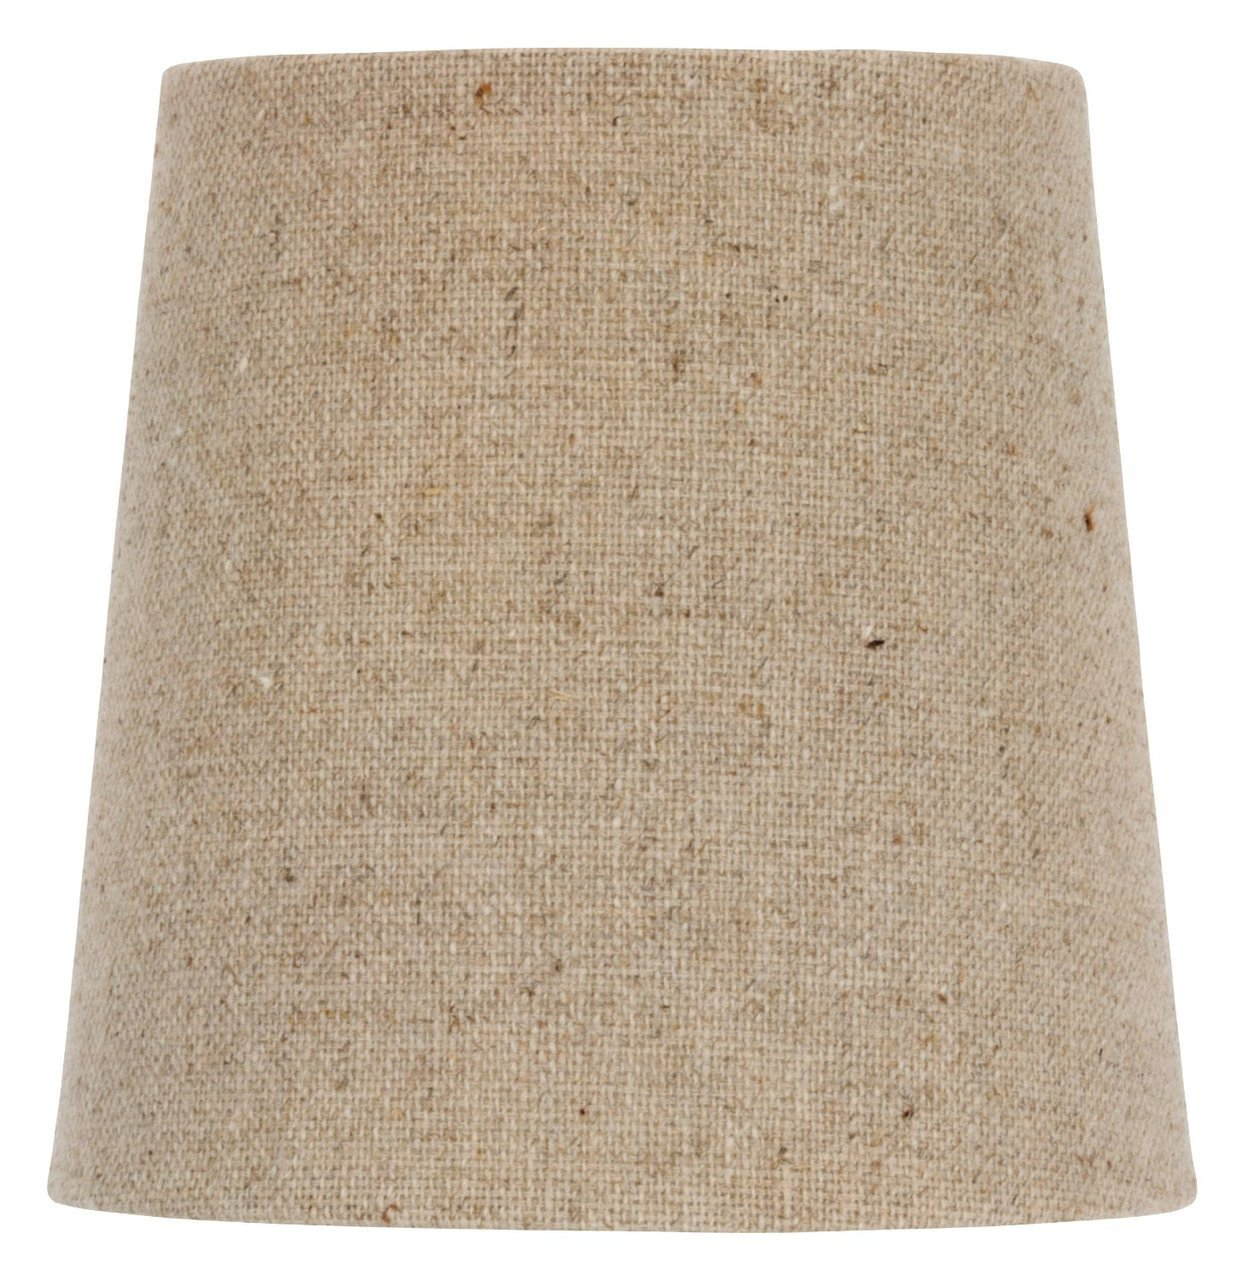 Upgradelights (Set of 6) 4 Inch Retro Drum Clip On Chandelier Lamp ...